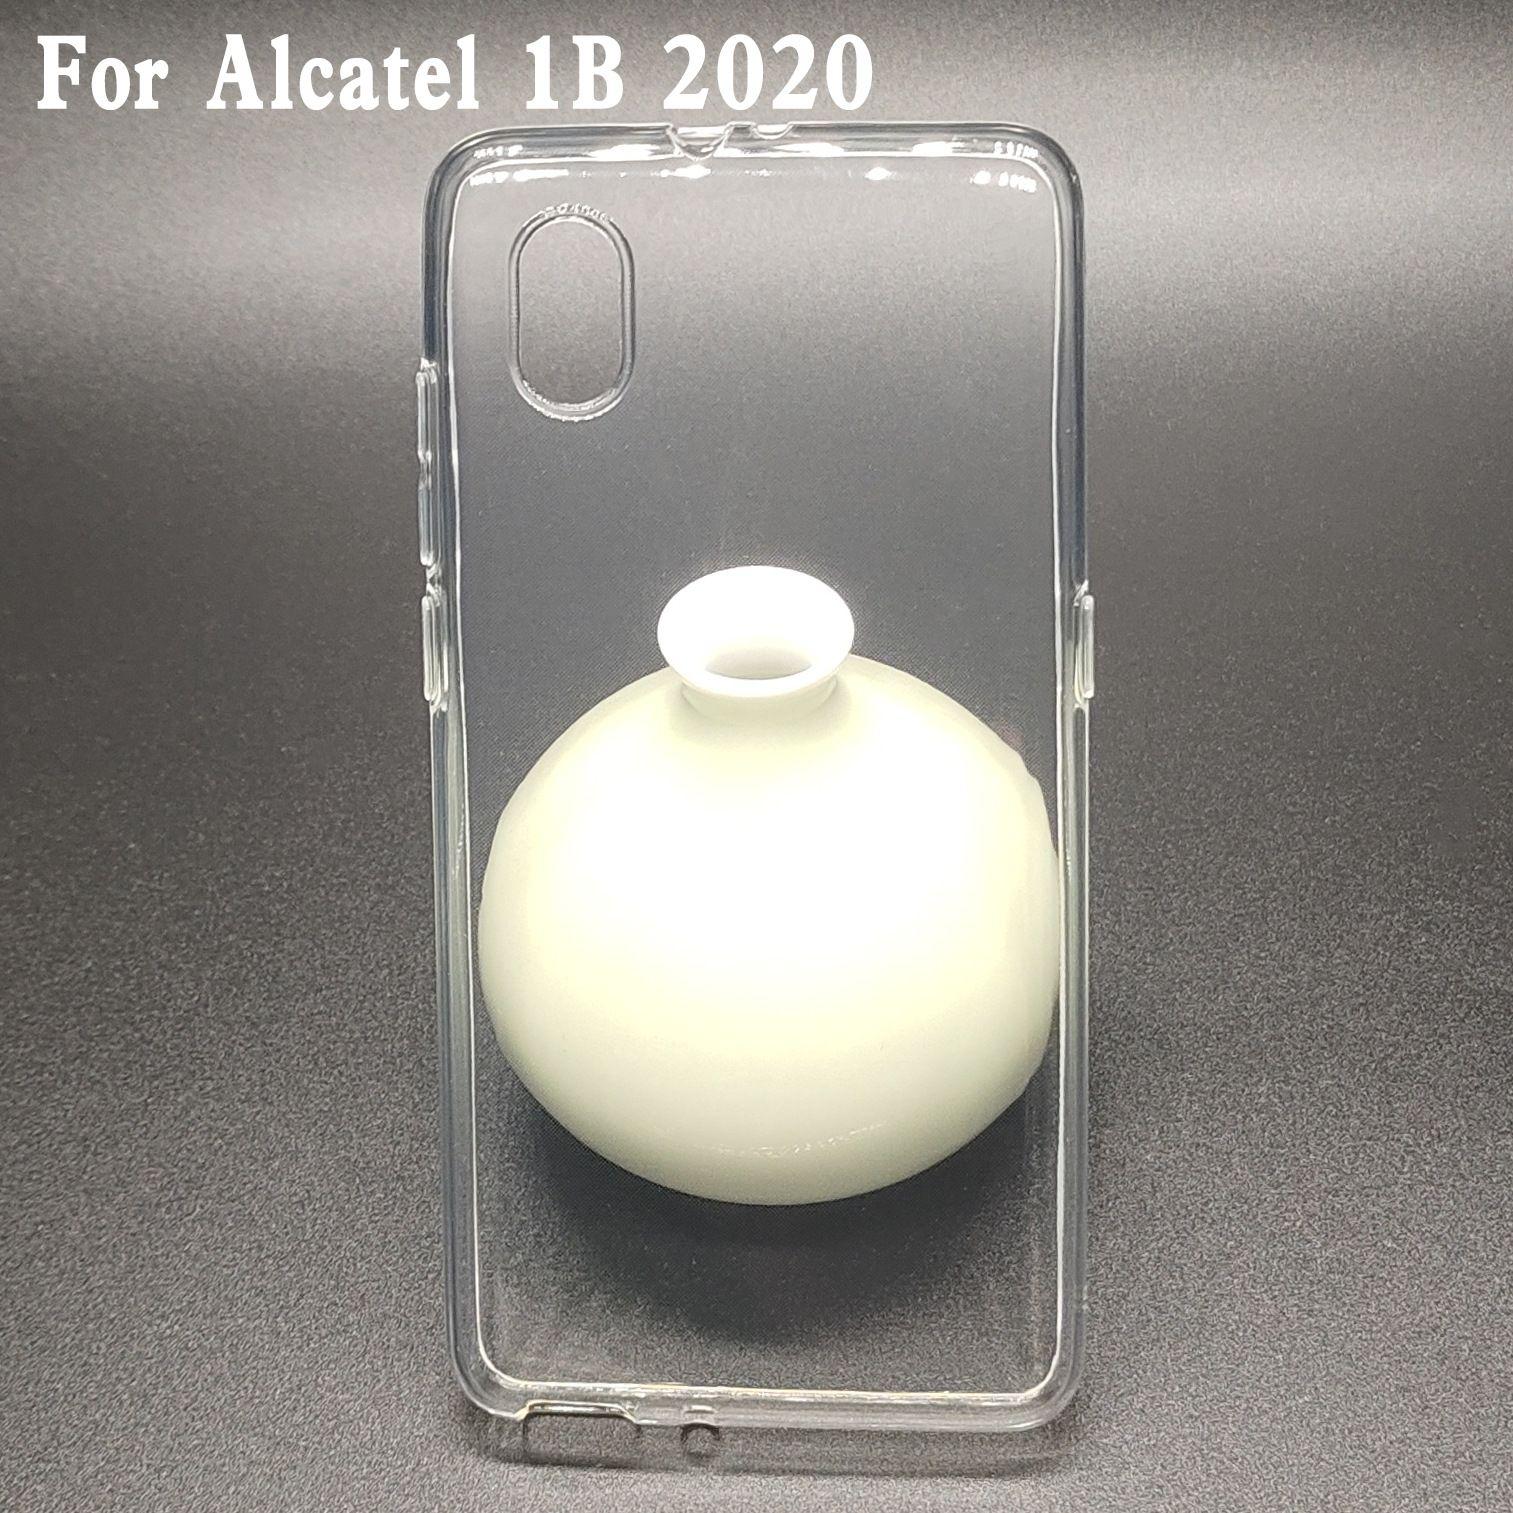 Spigen Ultra 하이브리드 유연한 슬림 얇은 Shockproof 보호 소프트 TPU Alcatel 1B 2020 용 투명 케이스